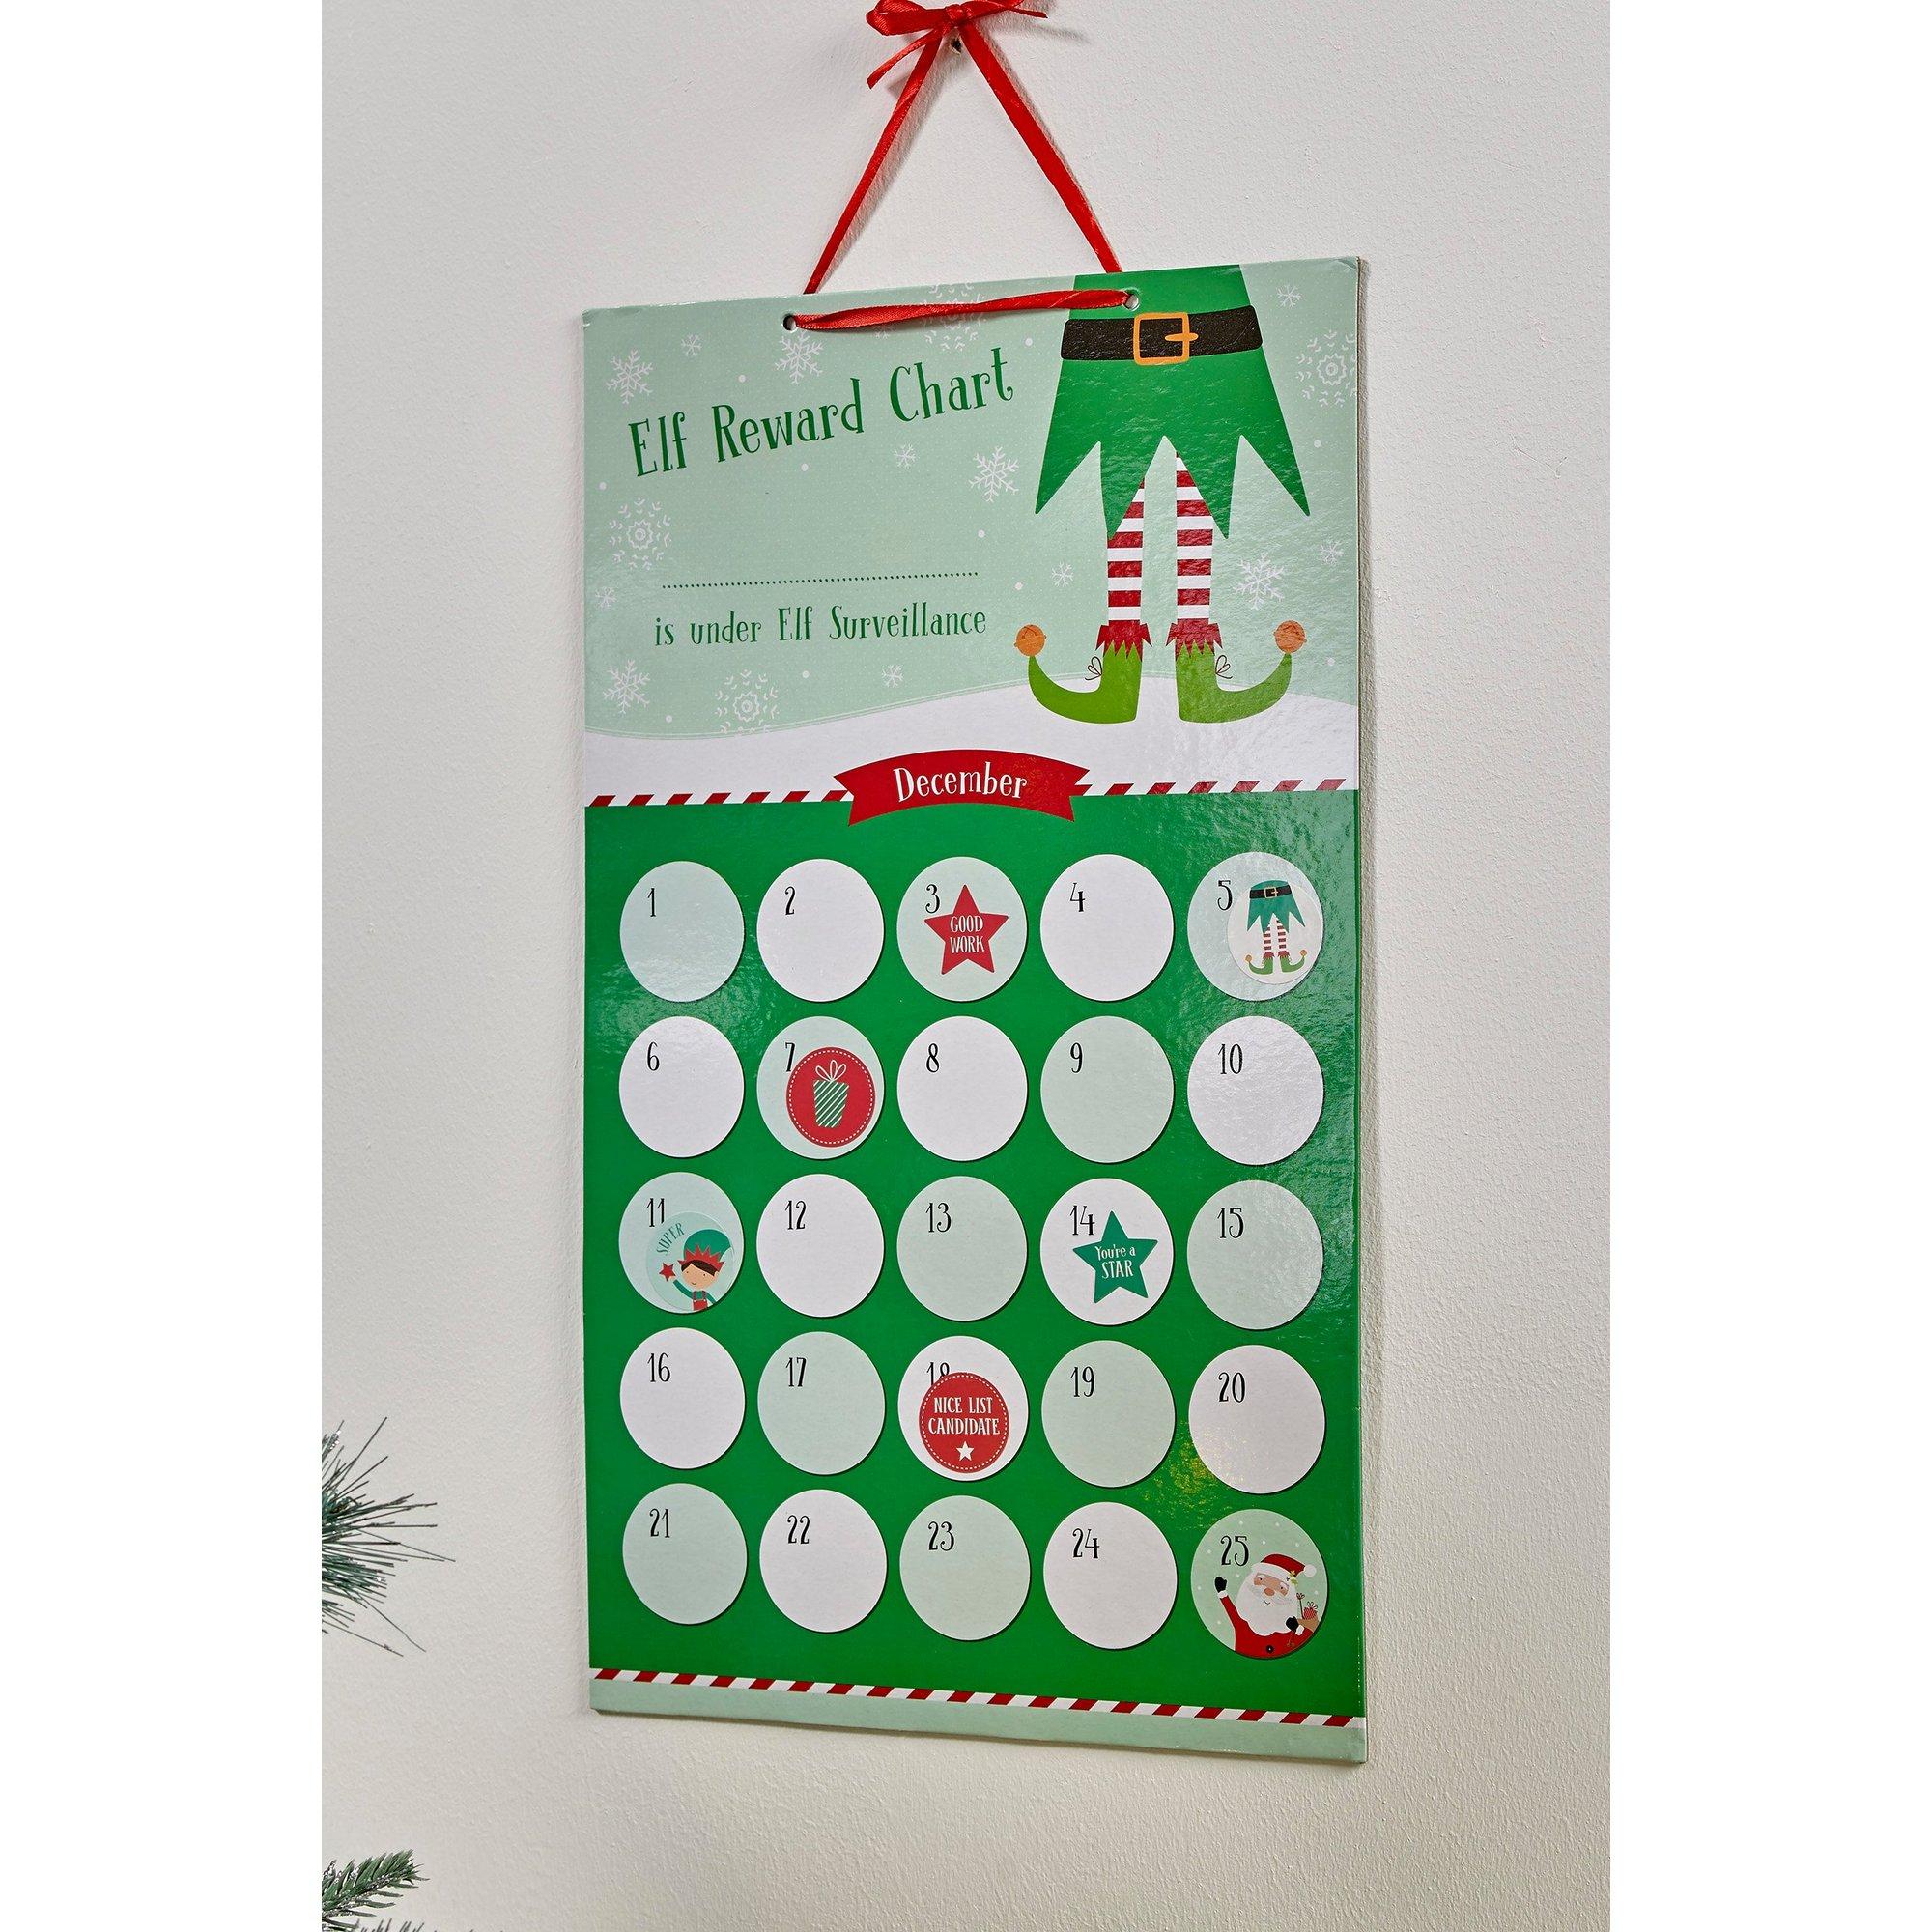 Image of Elf Reward Chart